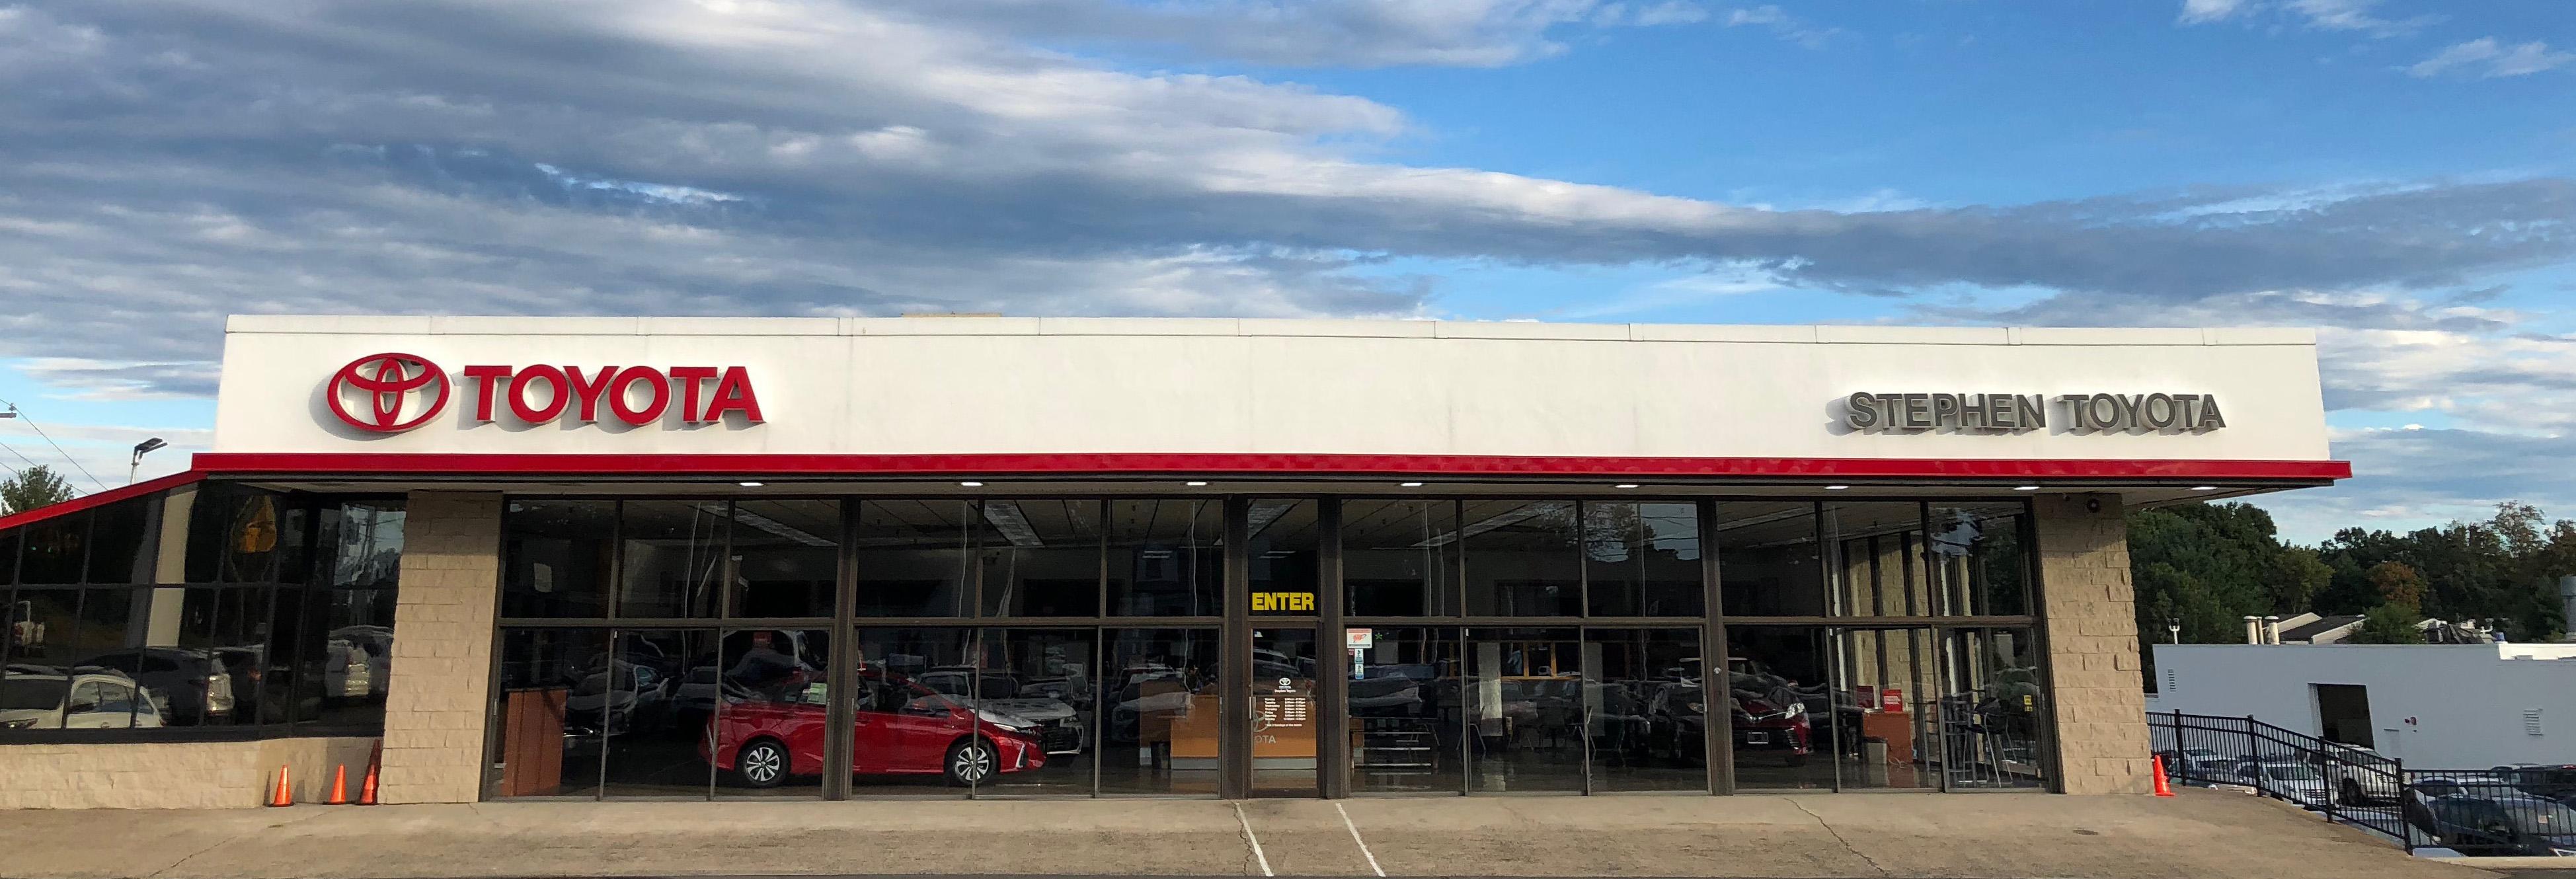 About Stephen Toyota In Bristol Connecticut Toyota Dealer Information